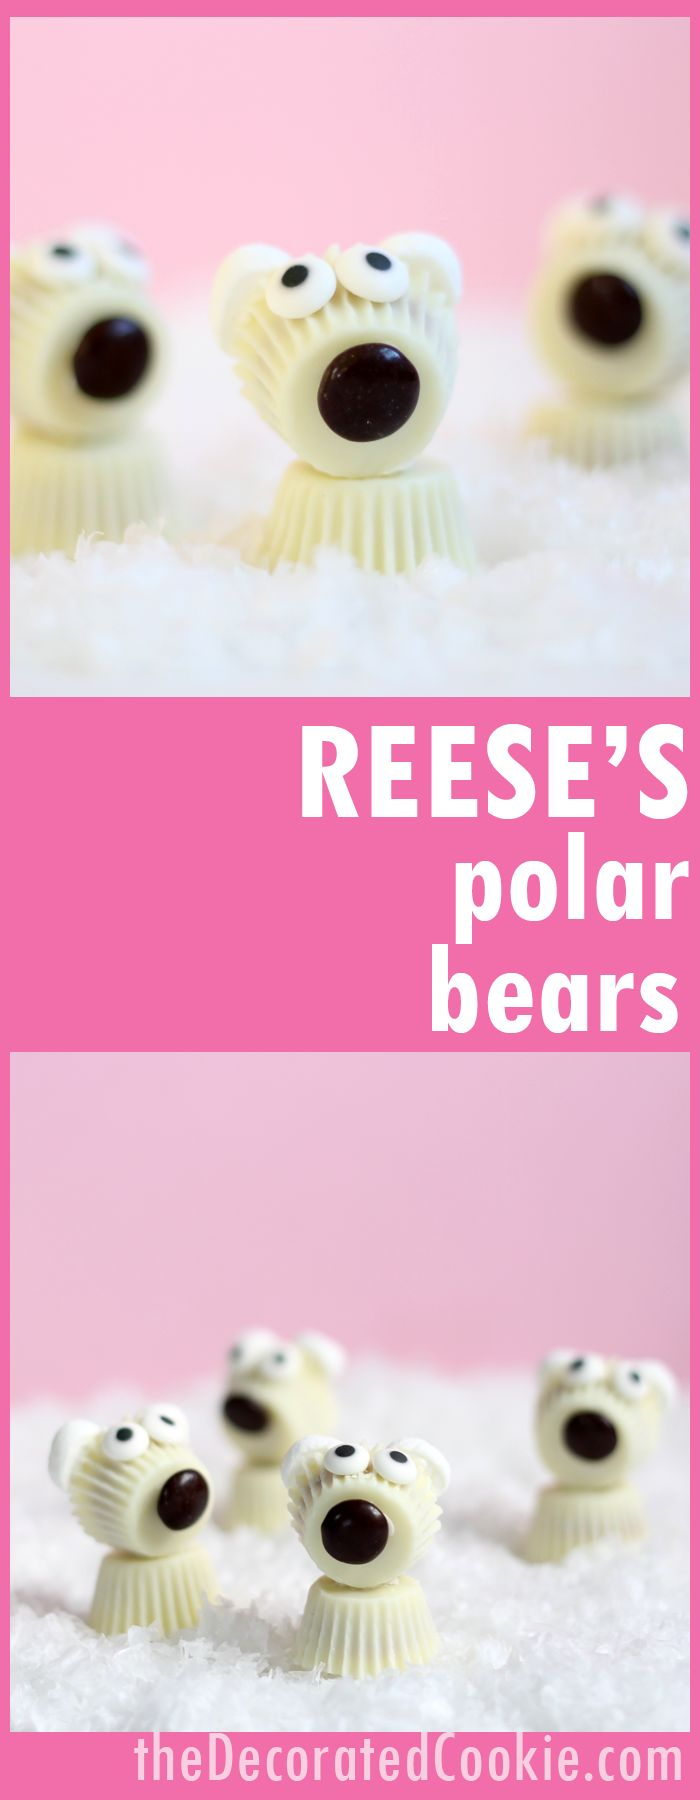 Reese's Peanut Butter Cups polar bears! Cute, fun Winter or Christmas treat. Winter animals fun food ideas.